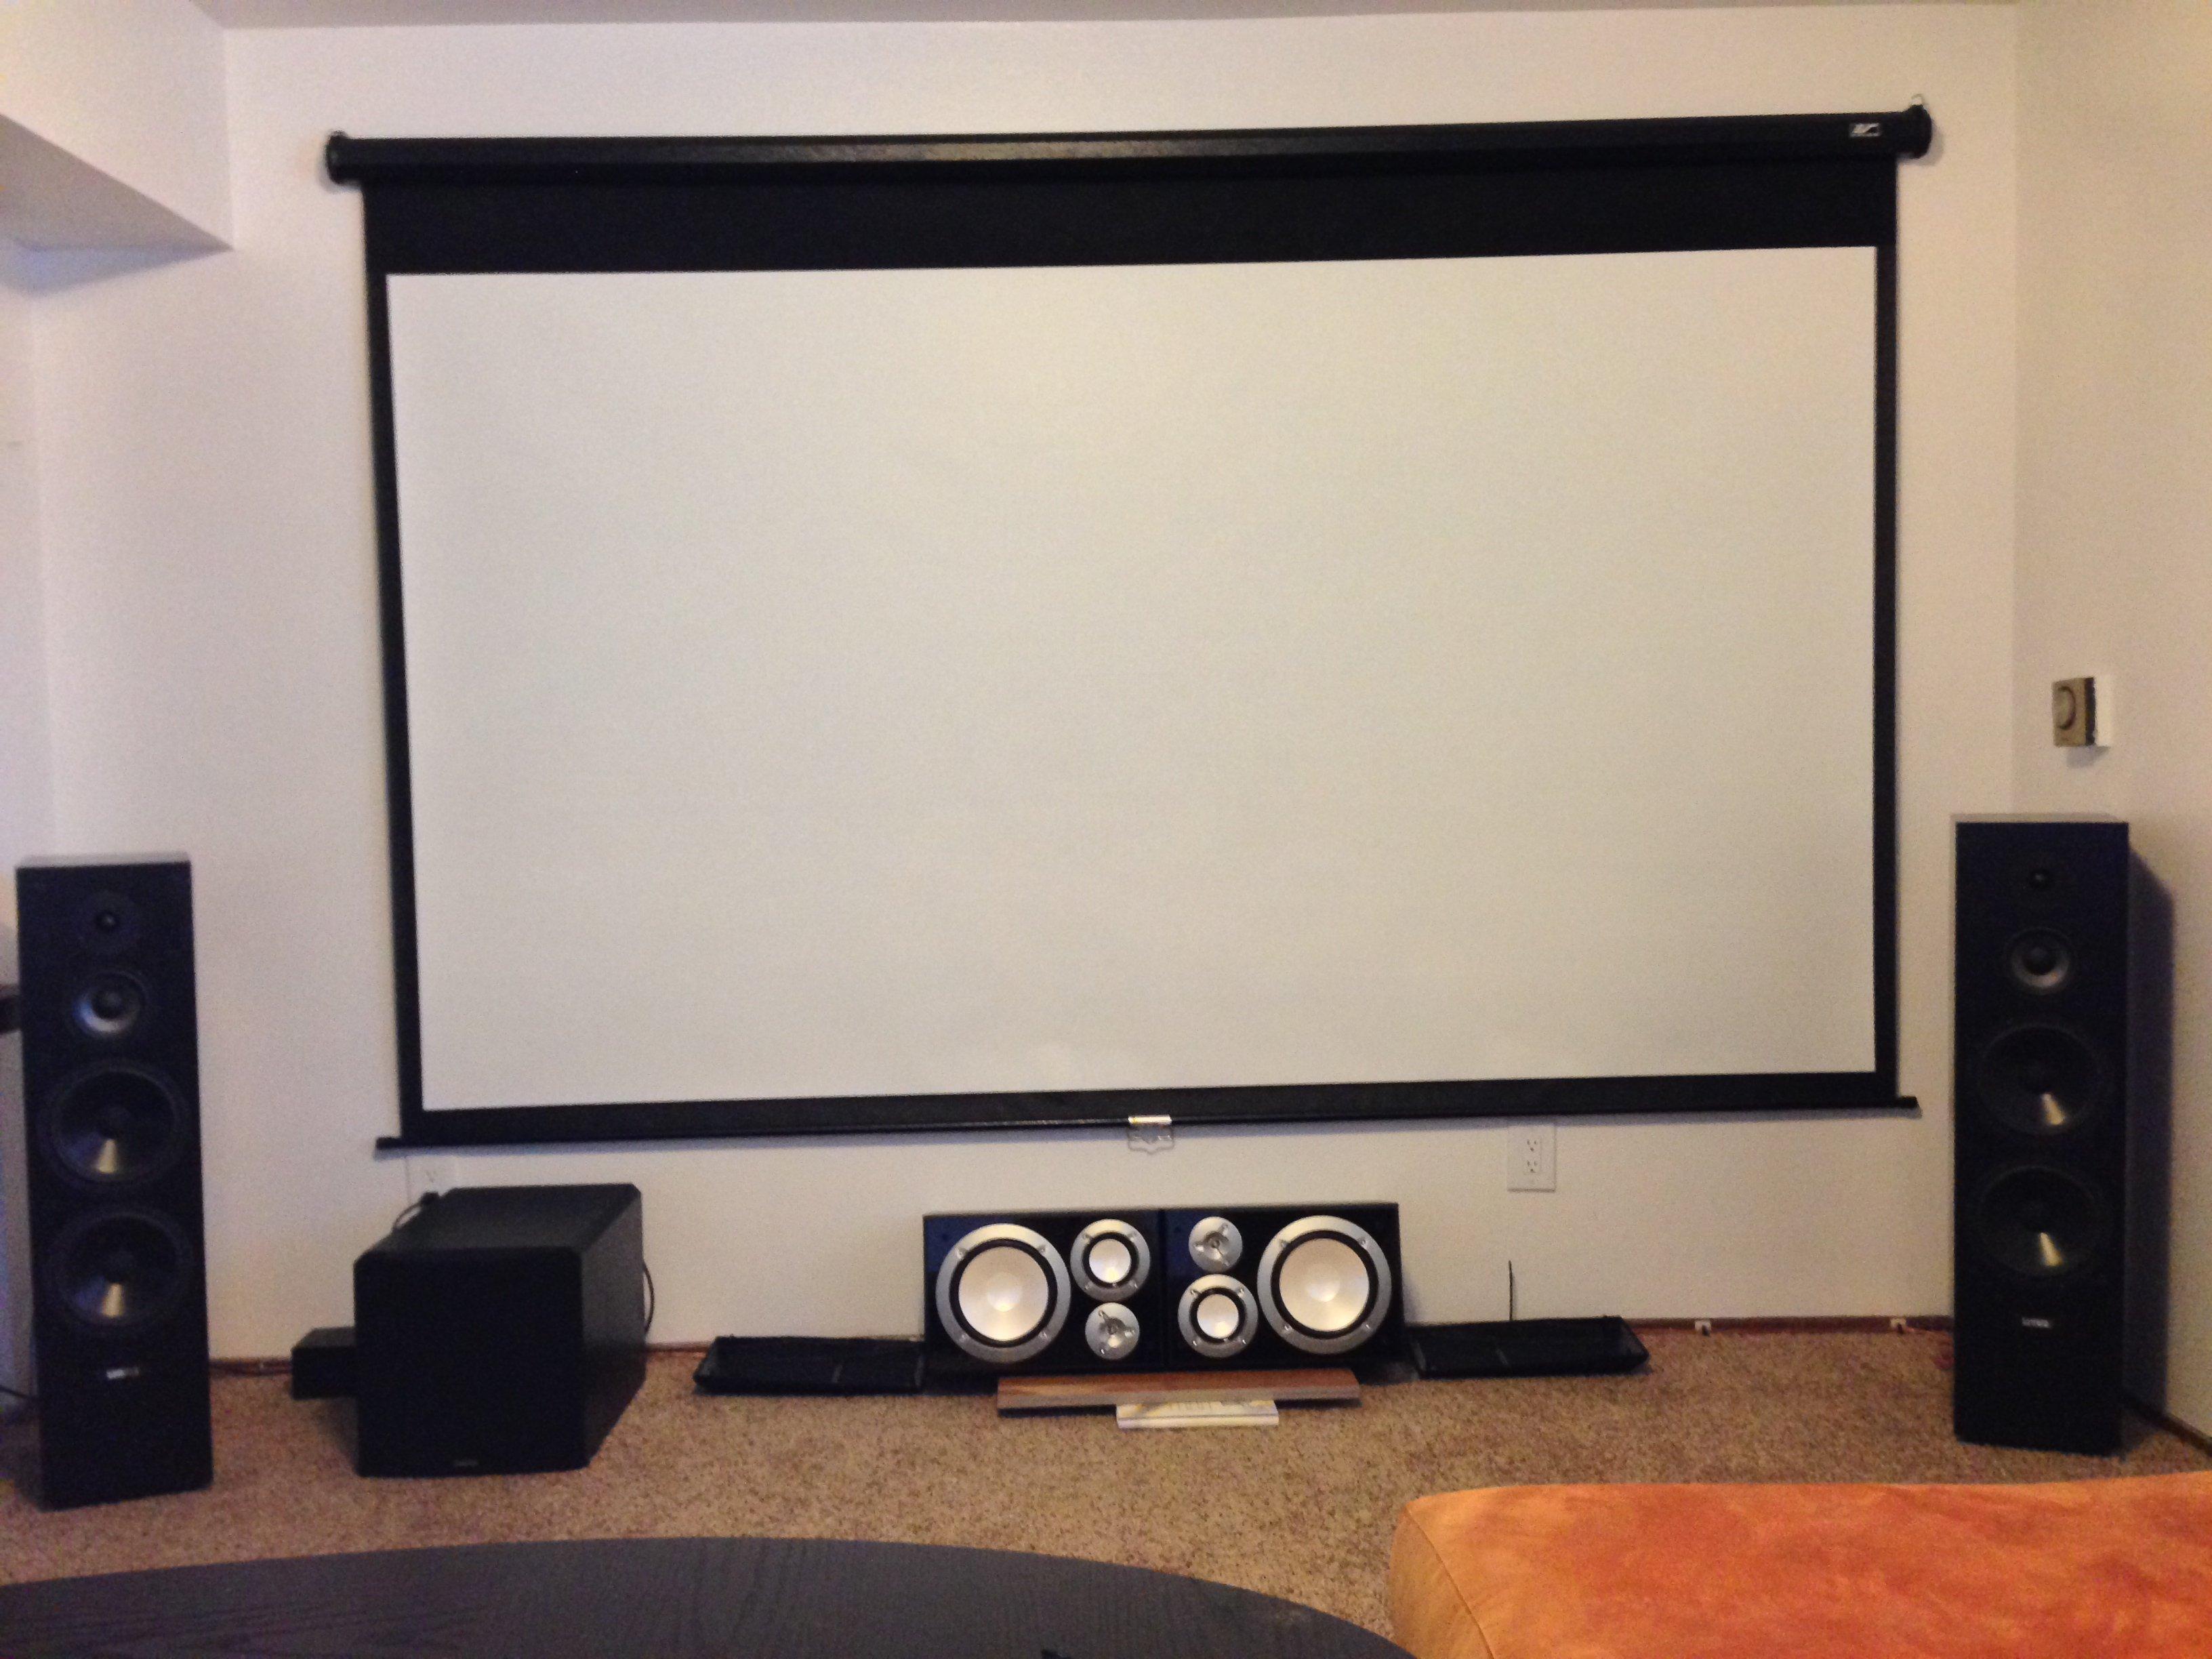 Dual center channel speaker setup - AVS Forum | Home Theater ...